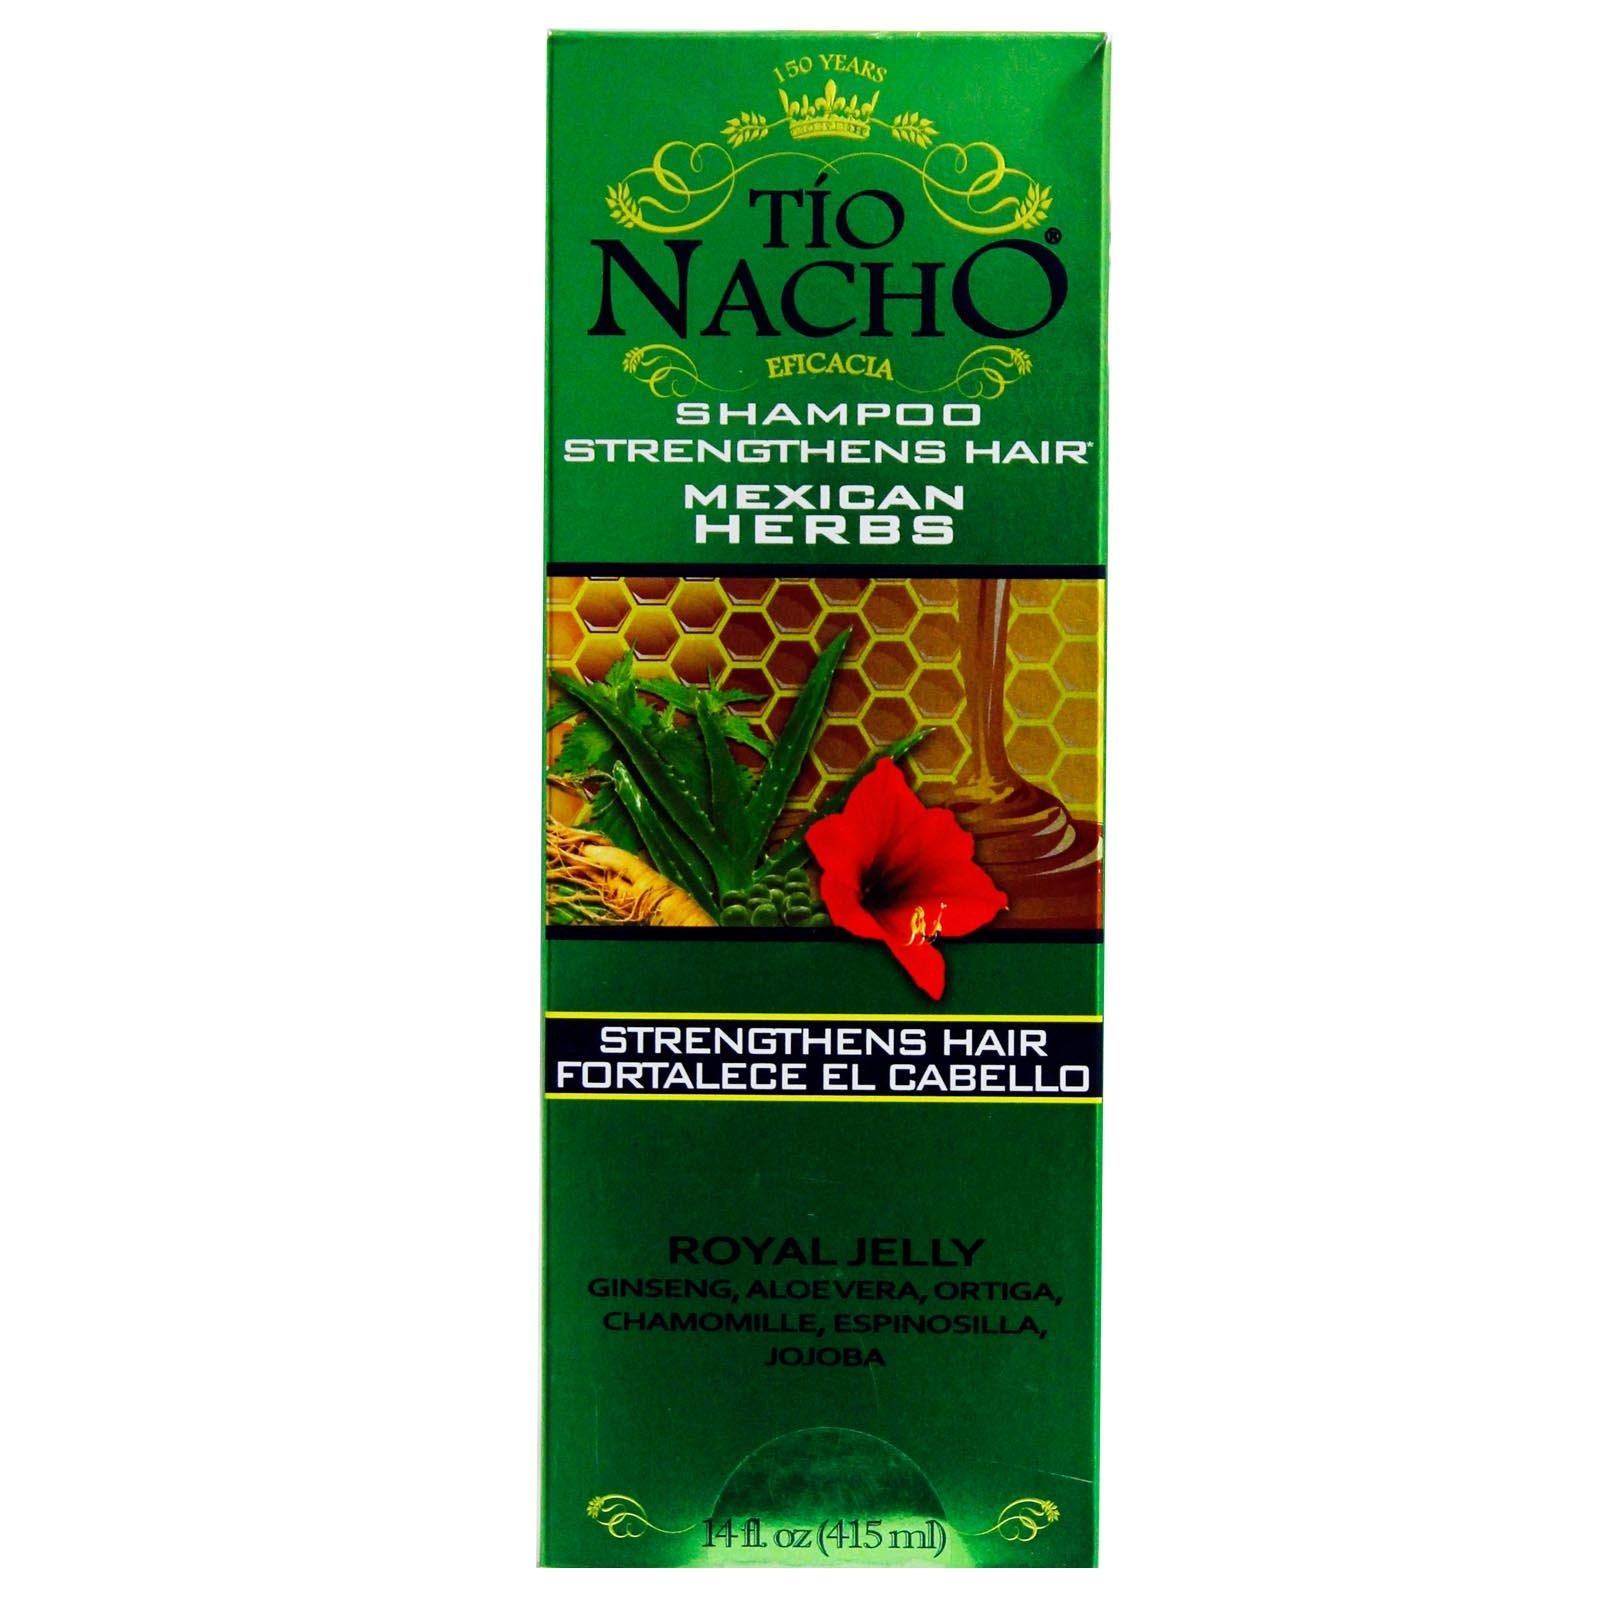 TIO NACHO Mexican Herbs Shampoo 14 oz (Pack of 6) by Tio Nacho